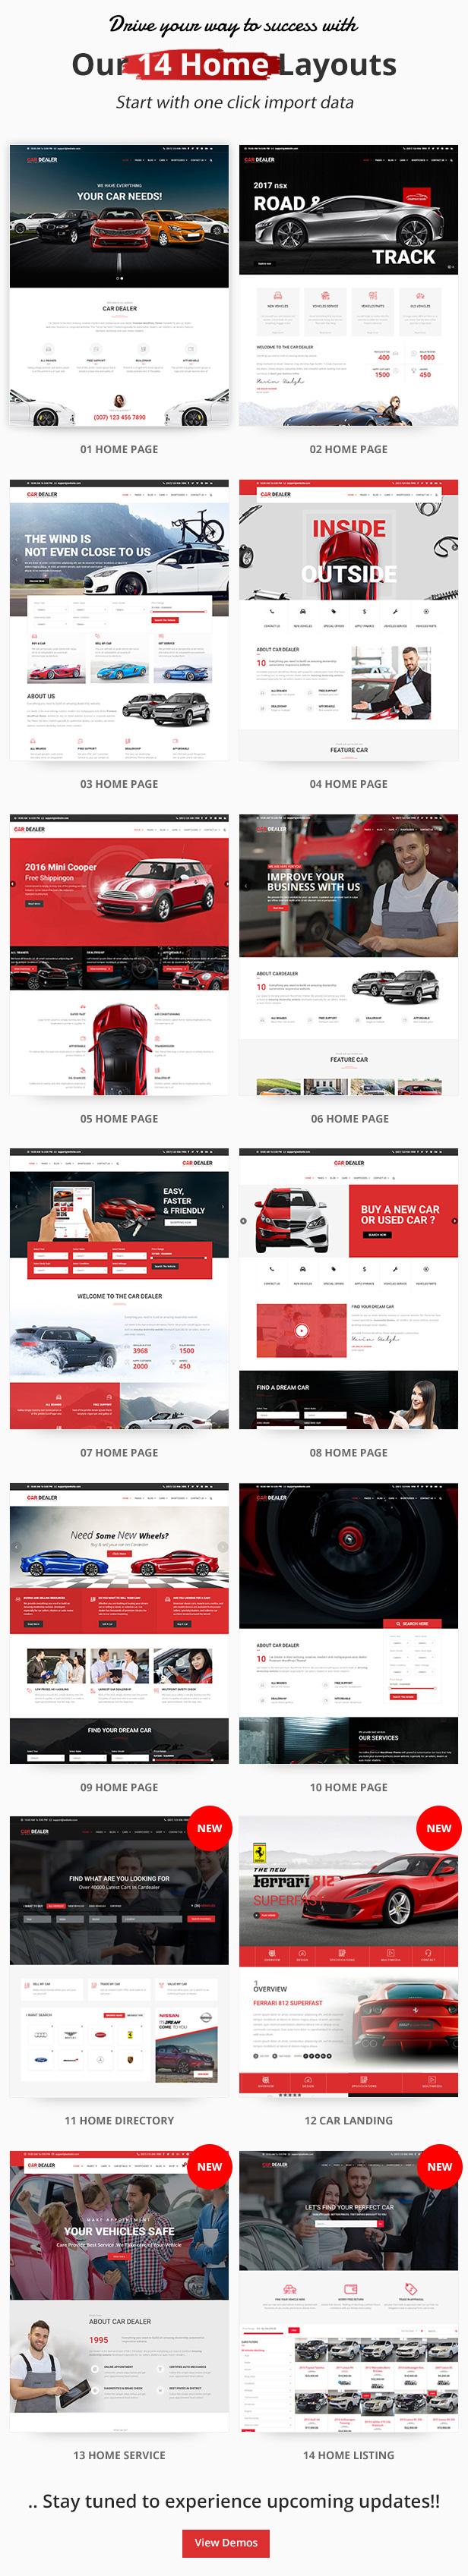 Car Dealer -  Automotive Responsive WordPress Theme - 6